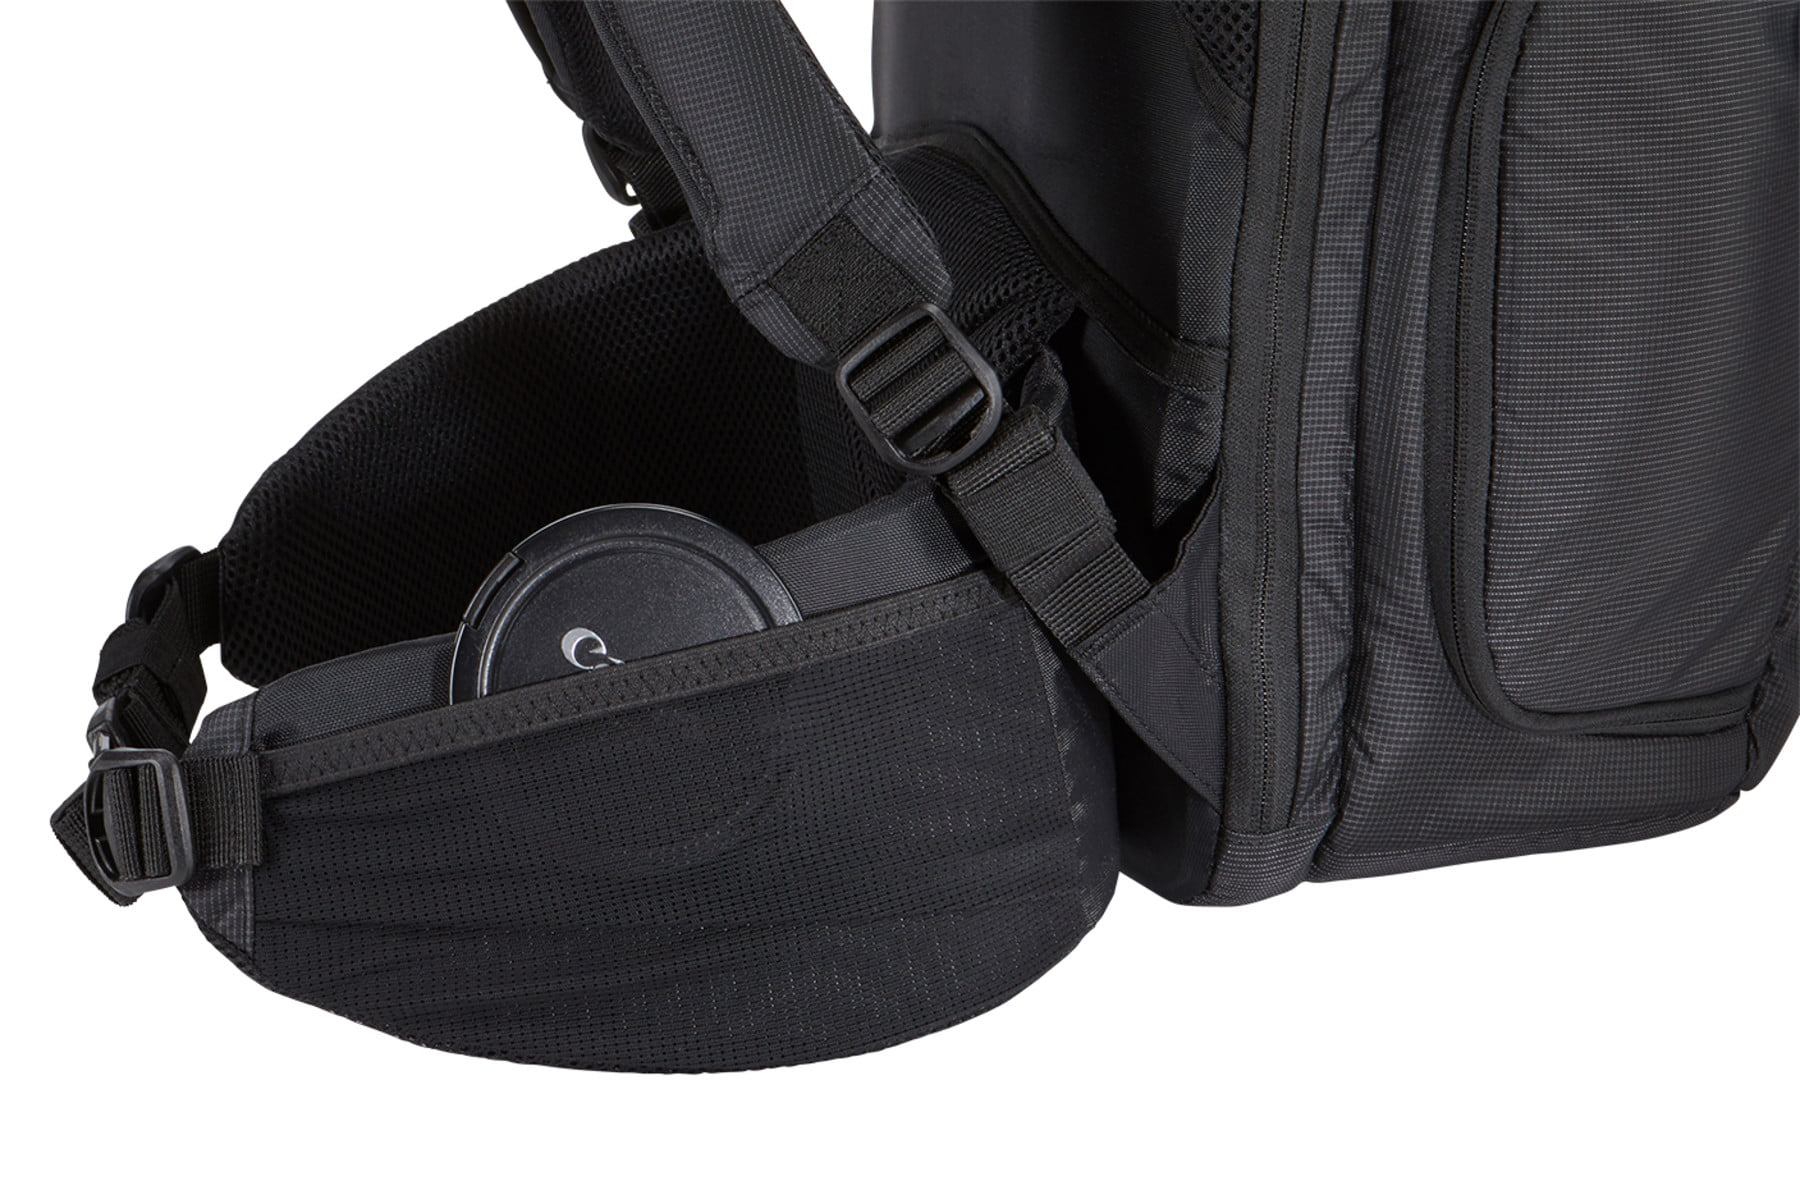 Rucsac foto Thule Aspect DSLR Backpack Negru 8